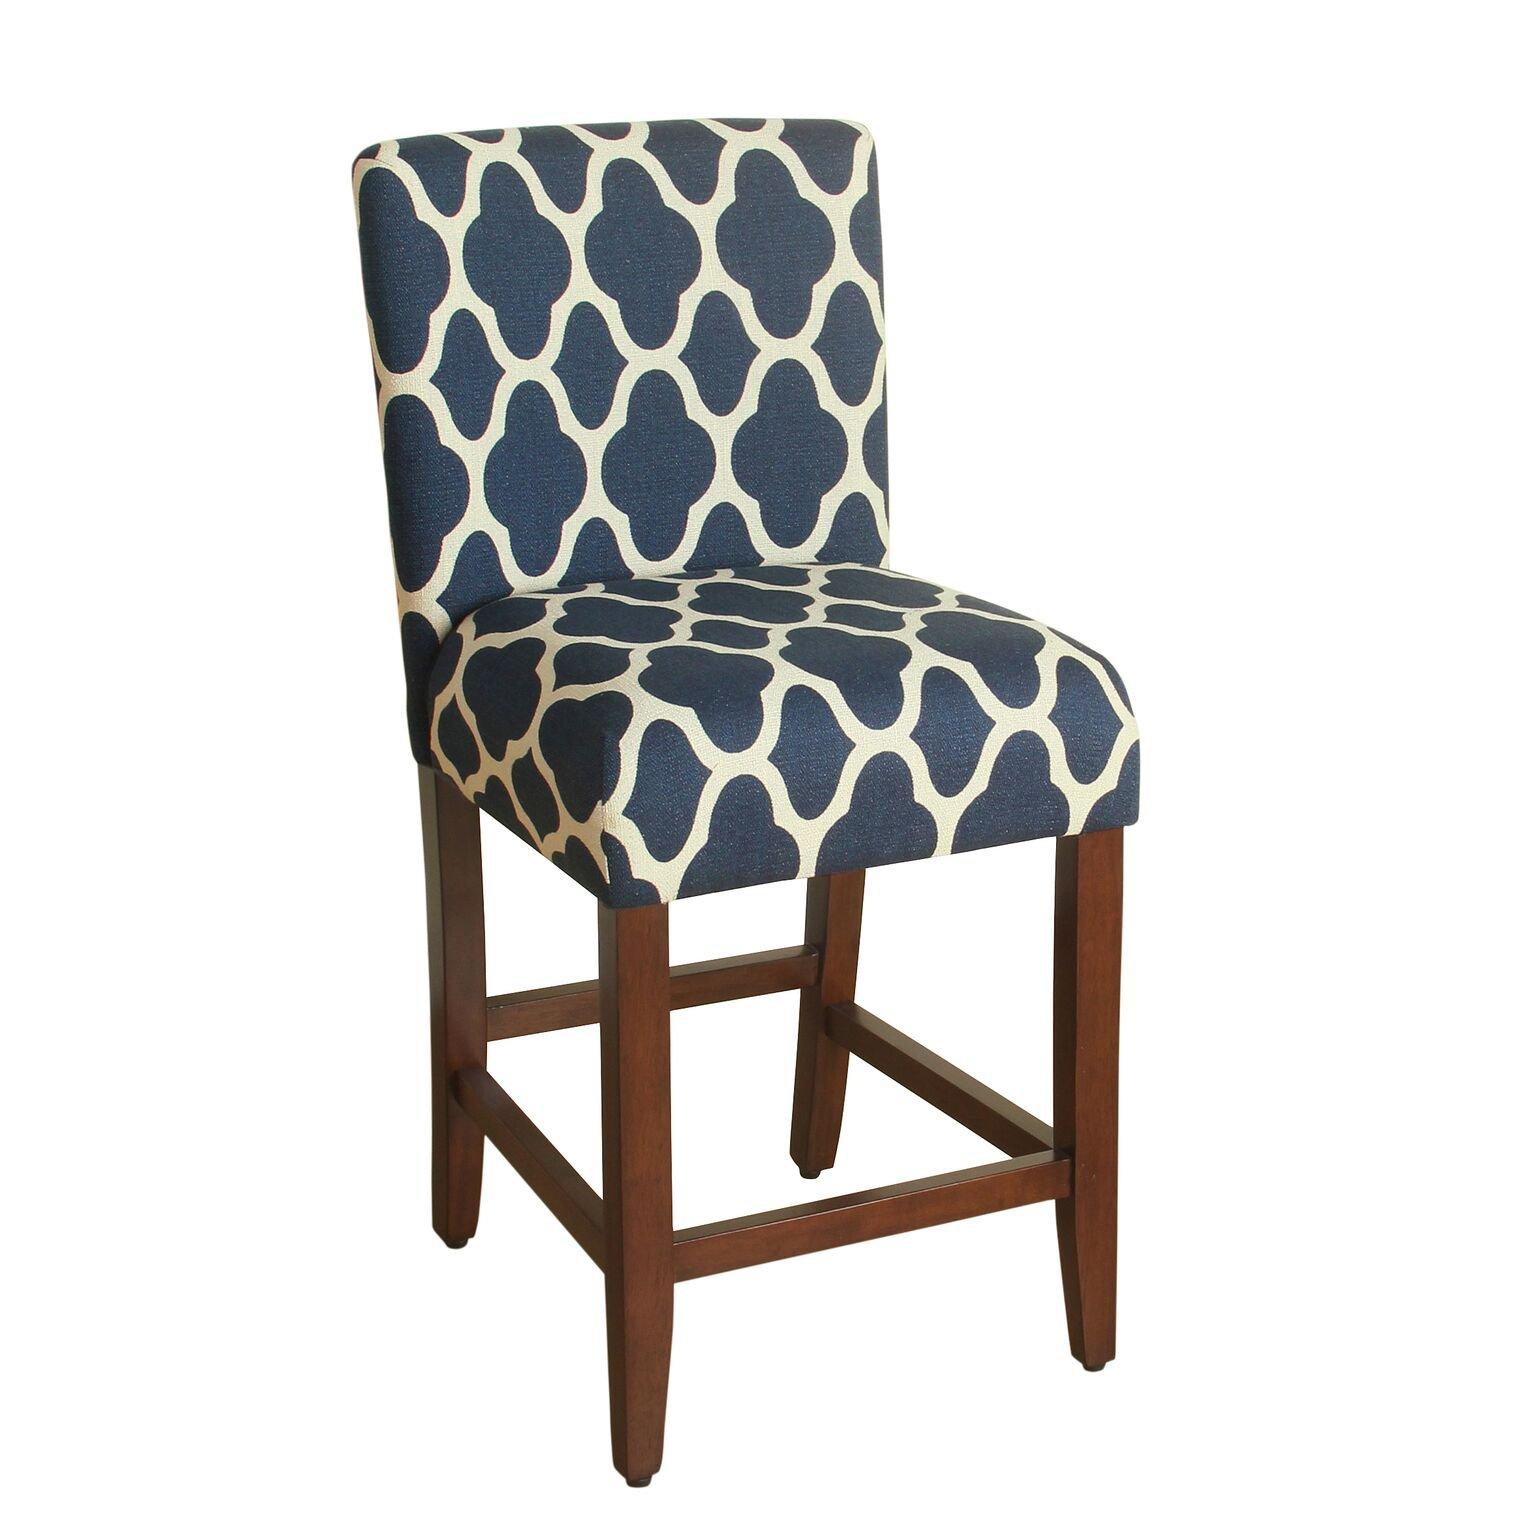 HomePop Upholstered Barstool, 24-inch, Navy and Cream Geometric